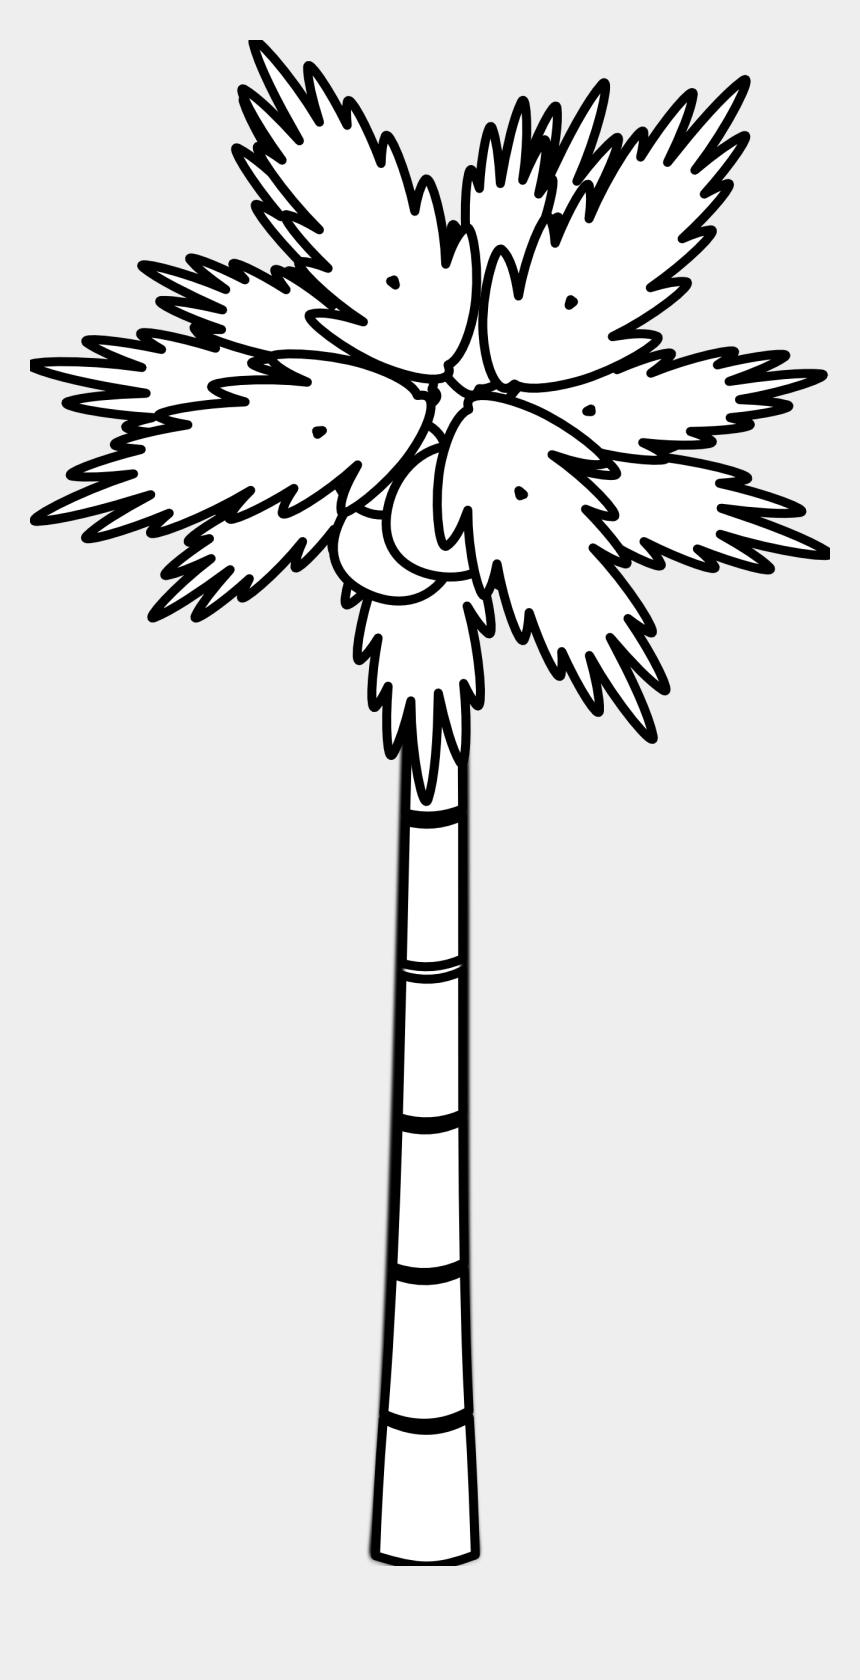 tree clipart, Cartoons - Black And White Family Tree - Coconut Tree In Black And White